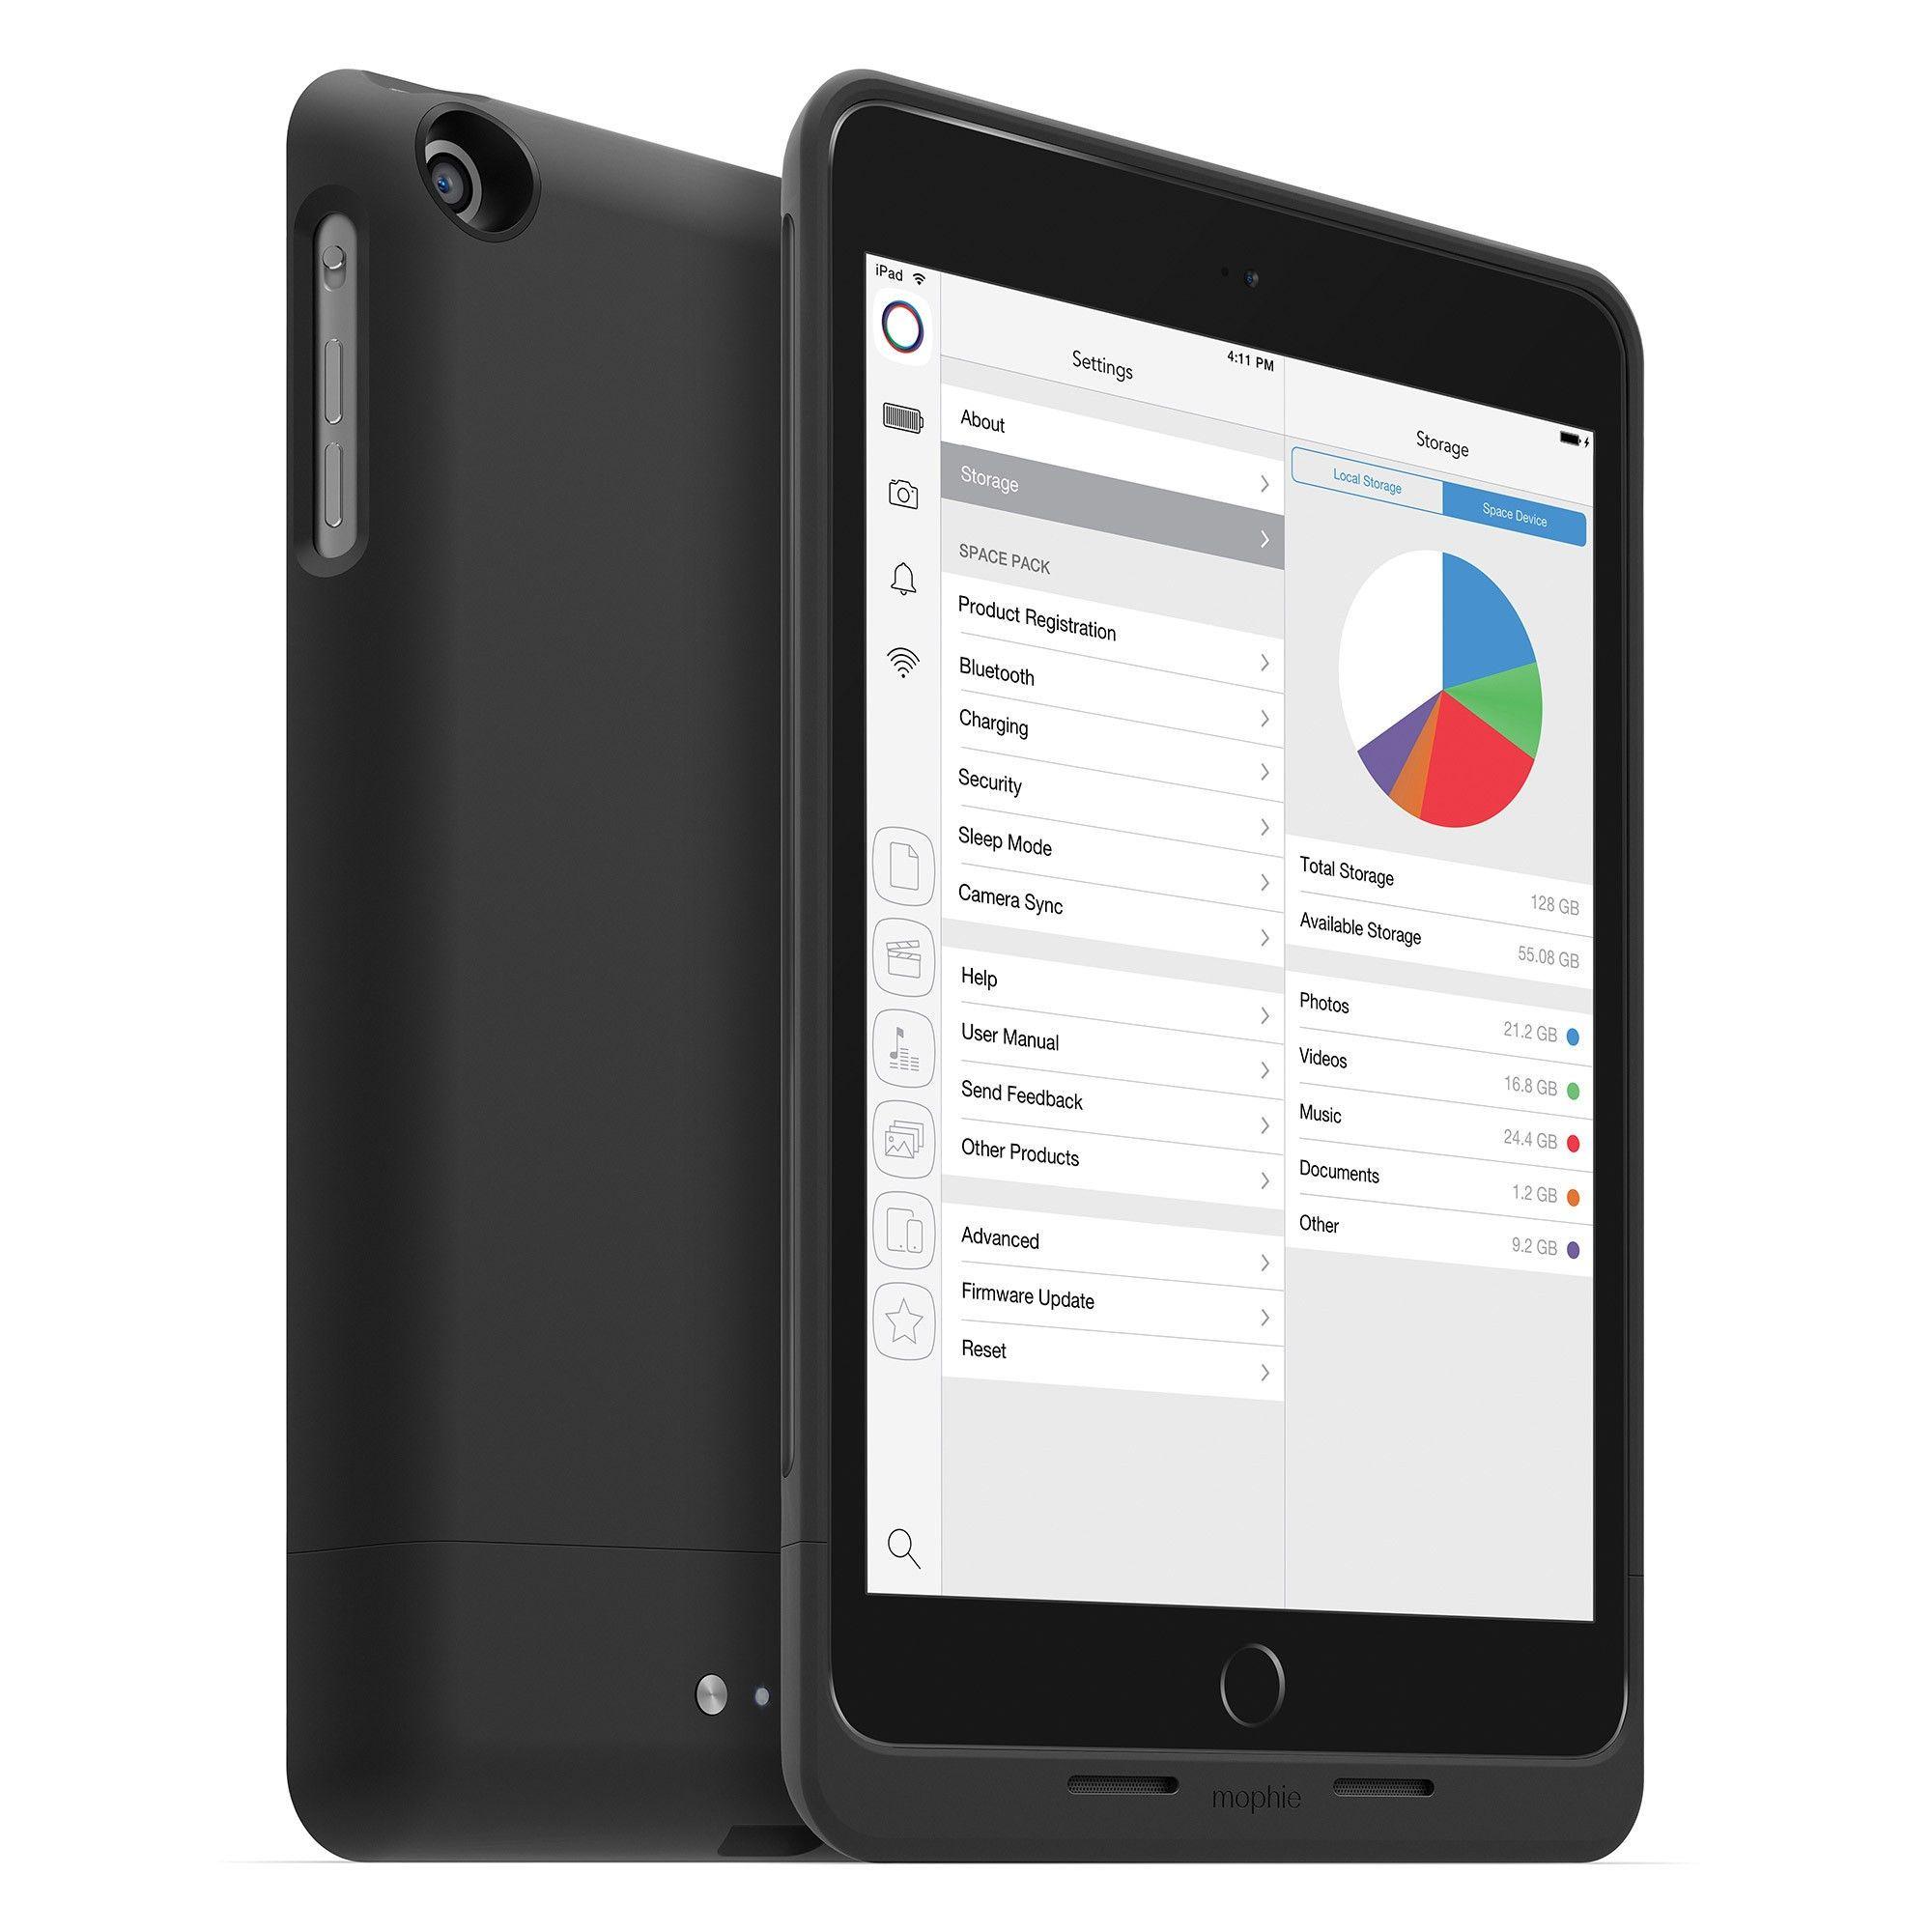 Ipad External Storage Space Pack For Ipad Mini Free Shipping Mophie Mophie Ipad Mini Apple Ipad Mini